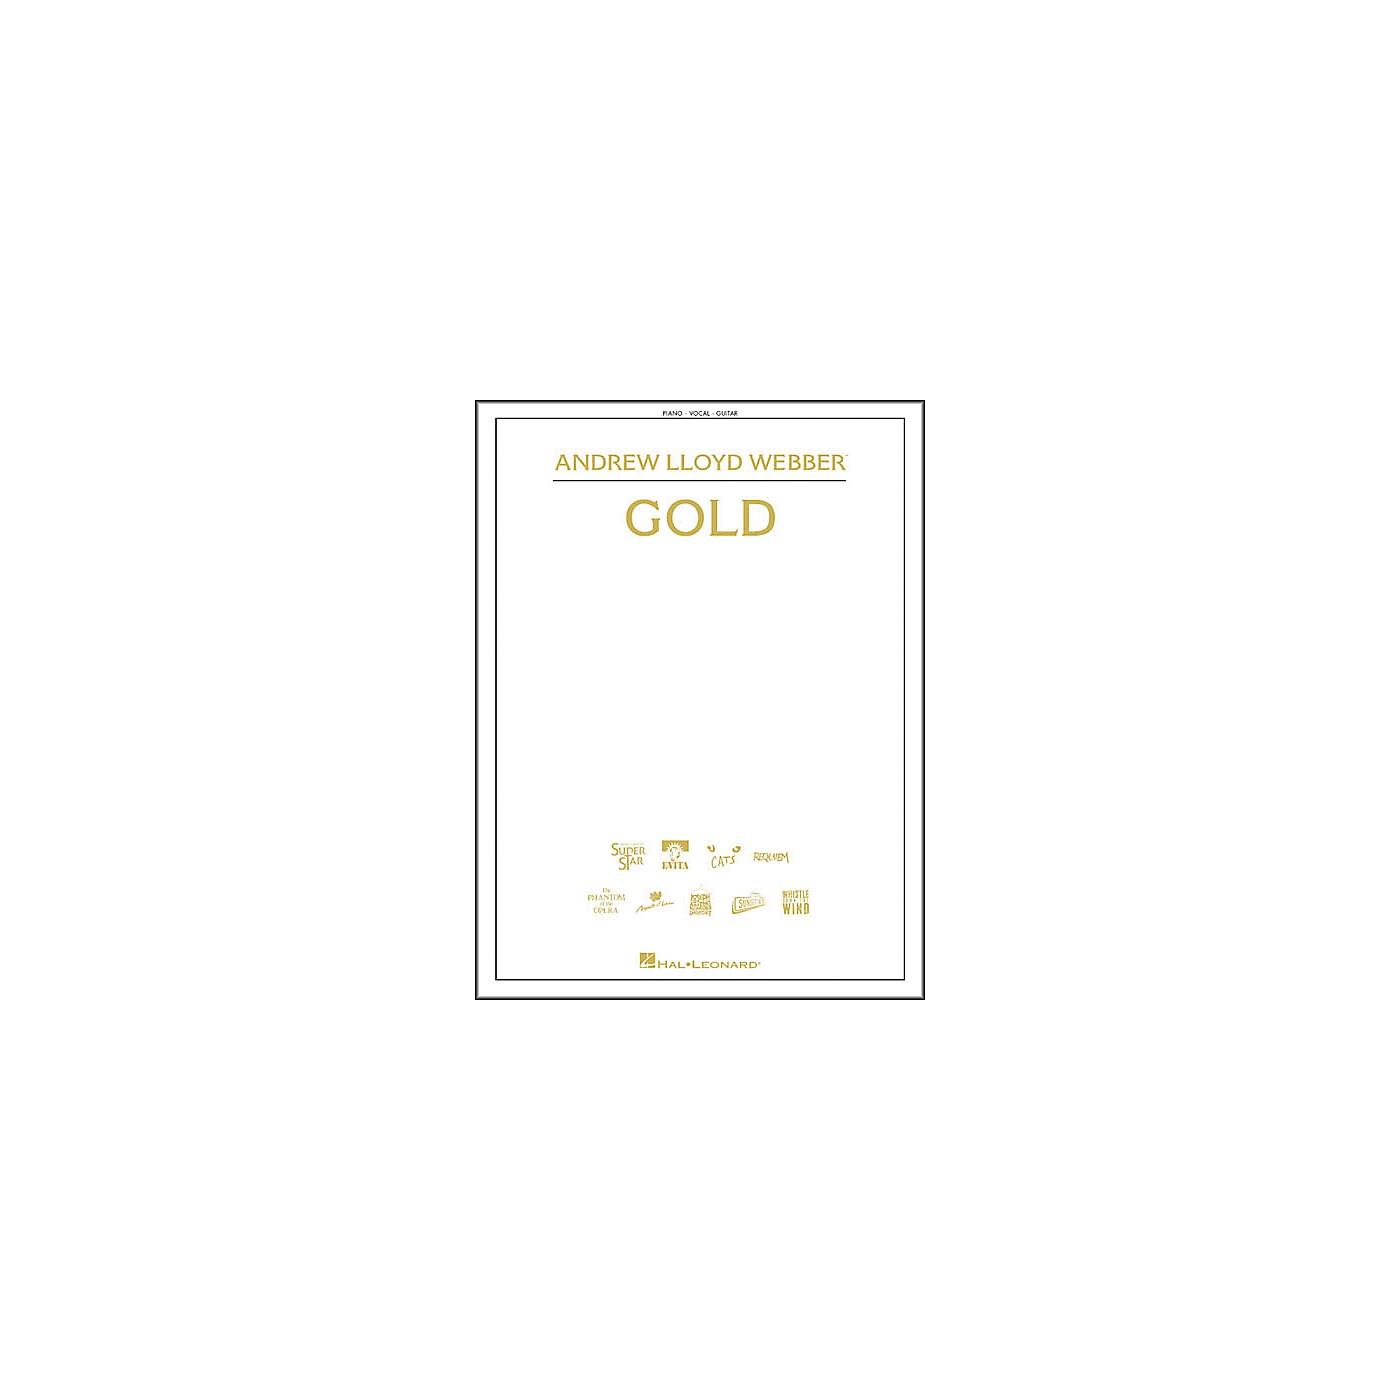 Hal Leonard Andrew Lloyd Webber - Gold Piano/Vocal/Guitar Songbook thumbnail